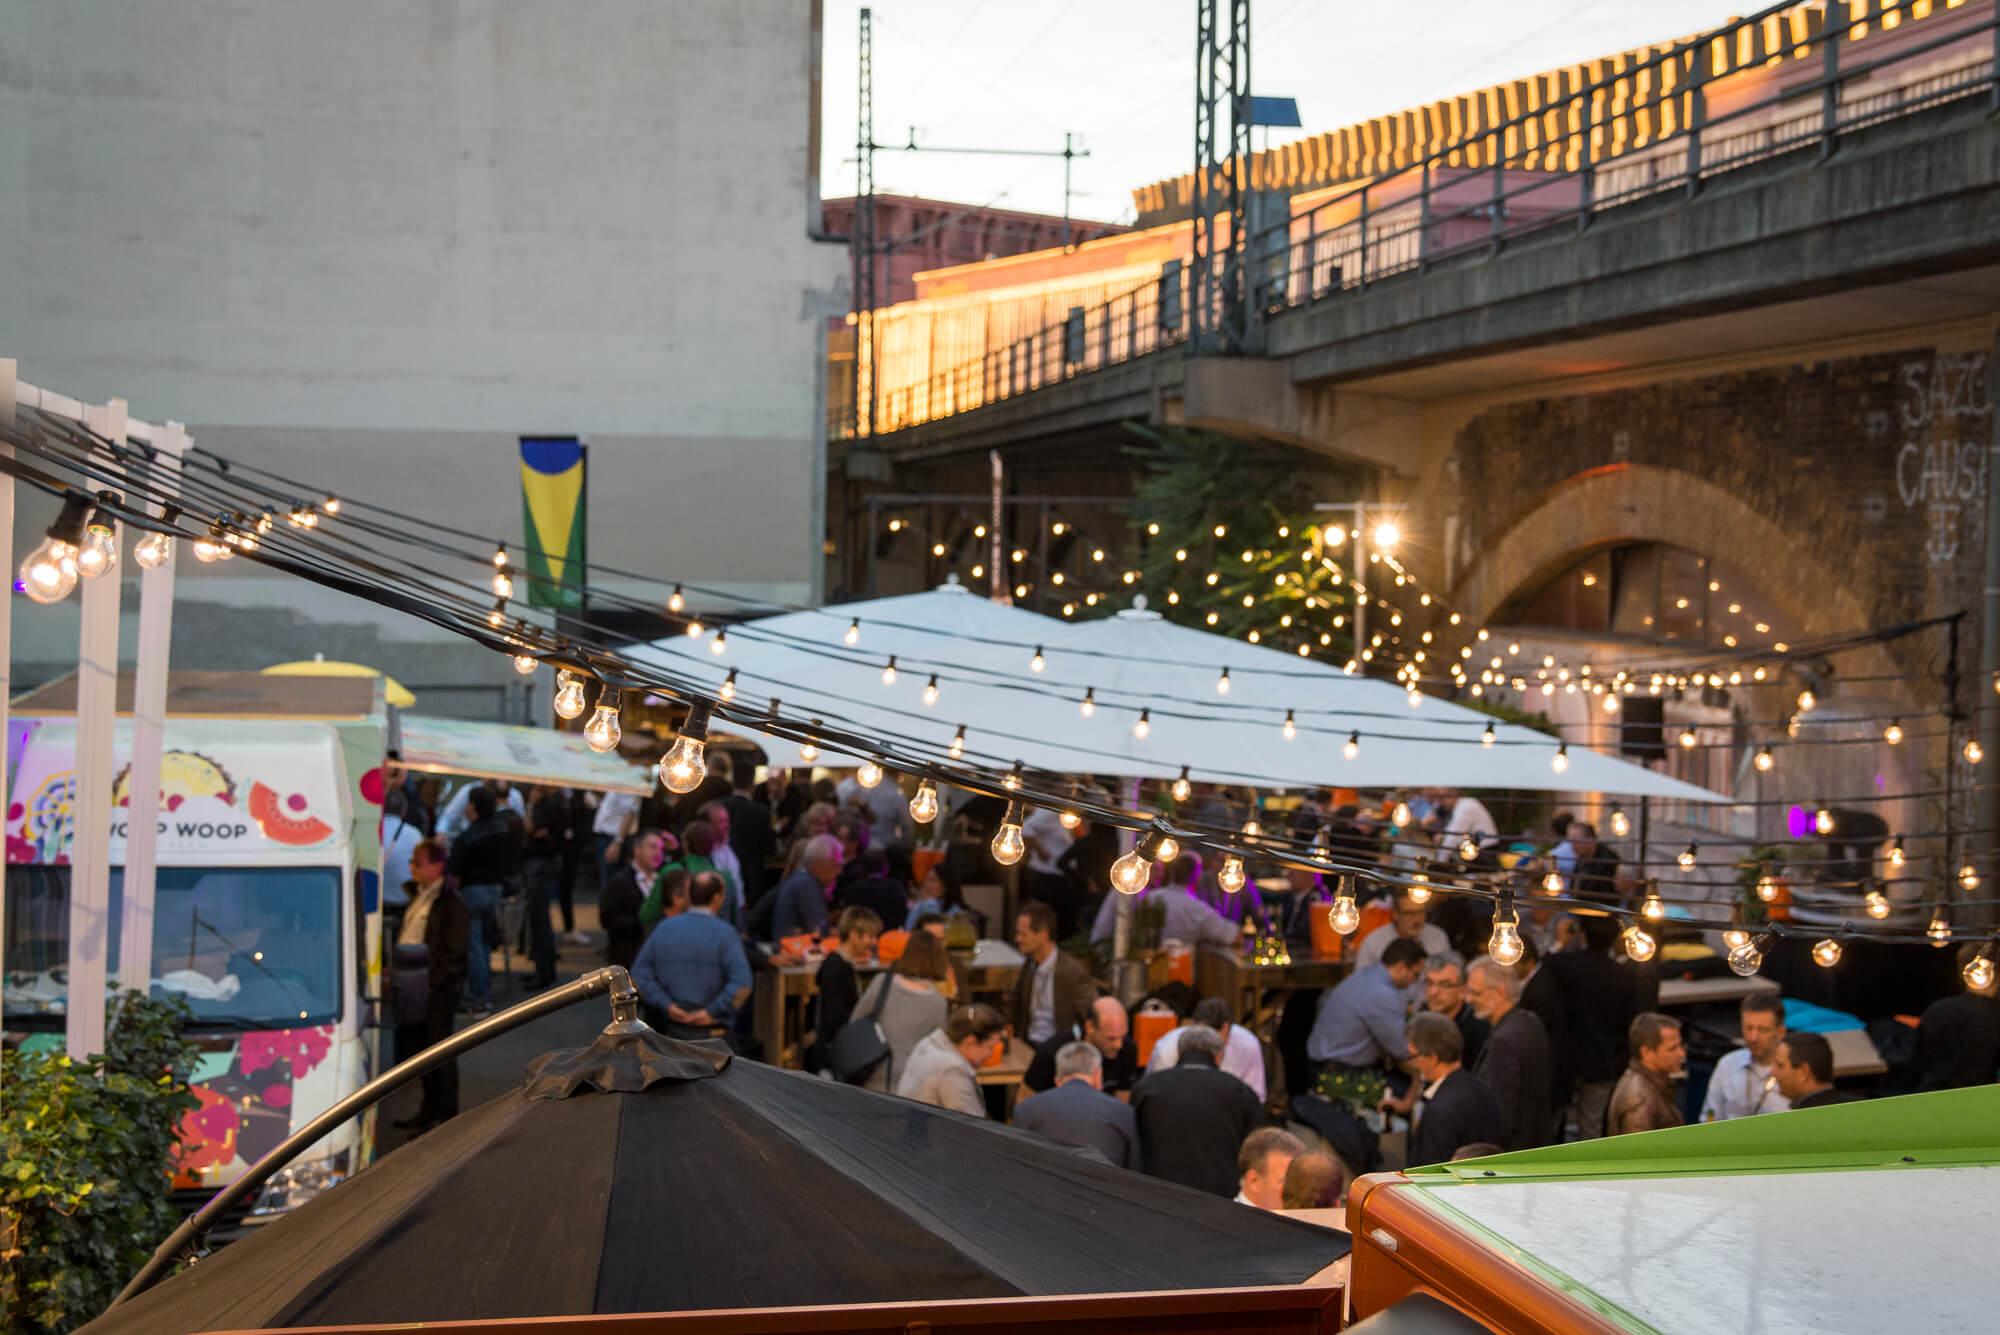 Street-Food-Festival-Catering-Firmenevents.jpg